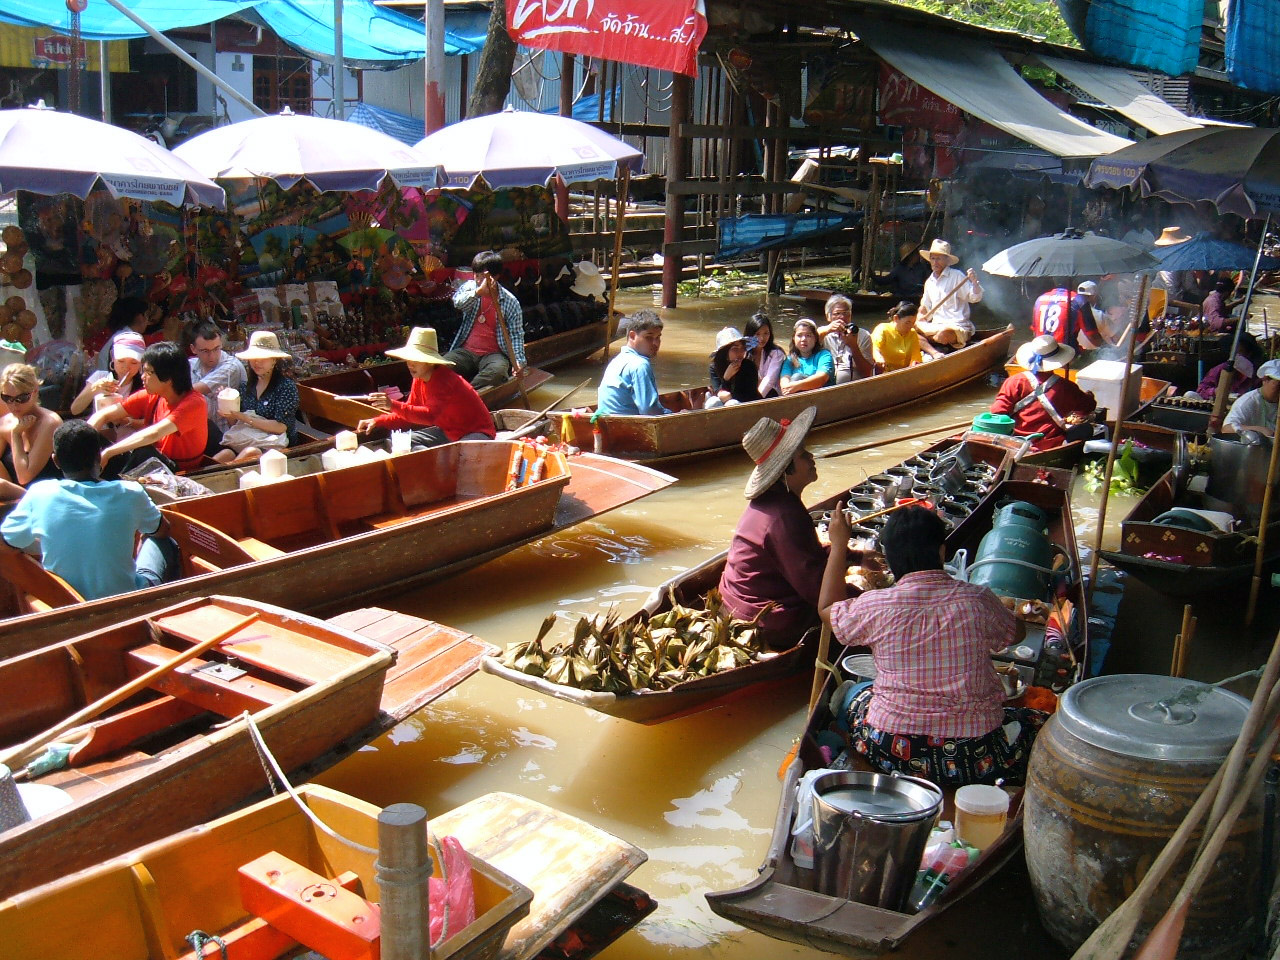 File:Floating market at Damnoen Saduak 2.JPG - Wikimedia ...